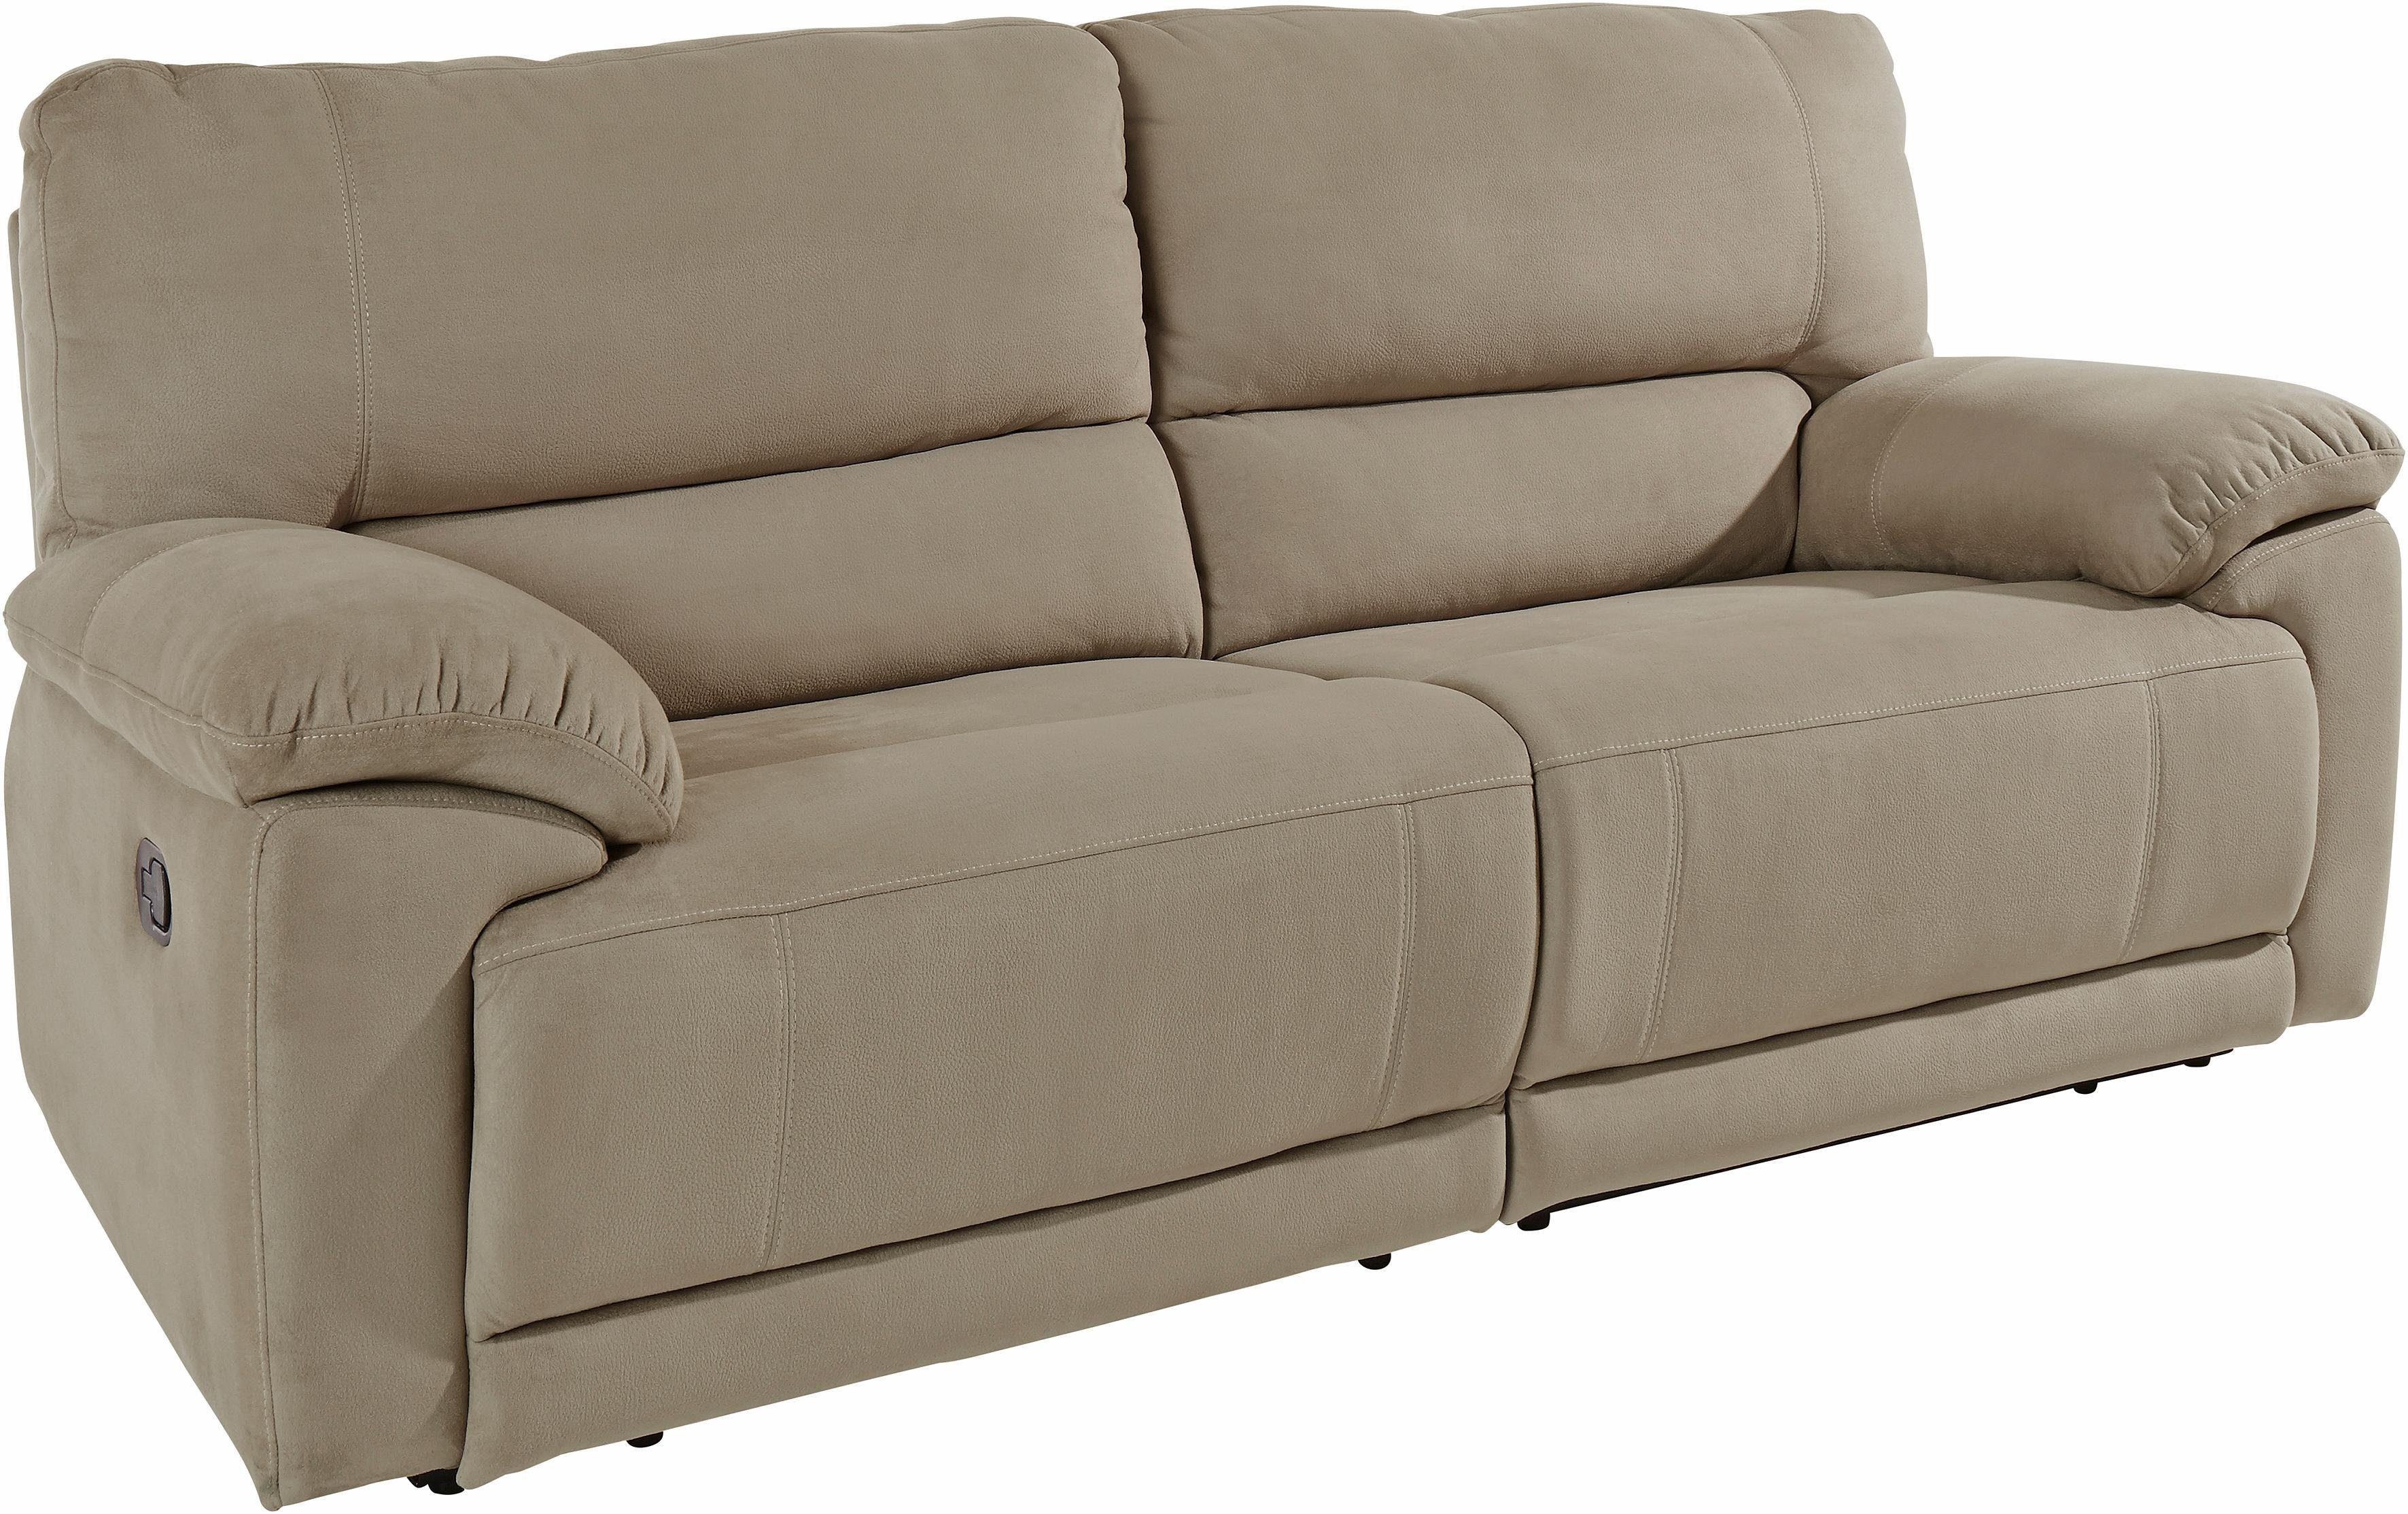 Atlantic Home Collection 3-Sitzer, mit Relaxfunktion und Federkern